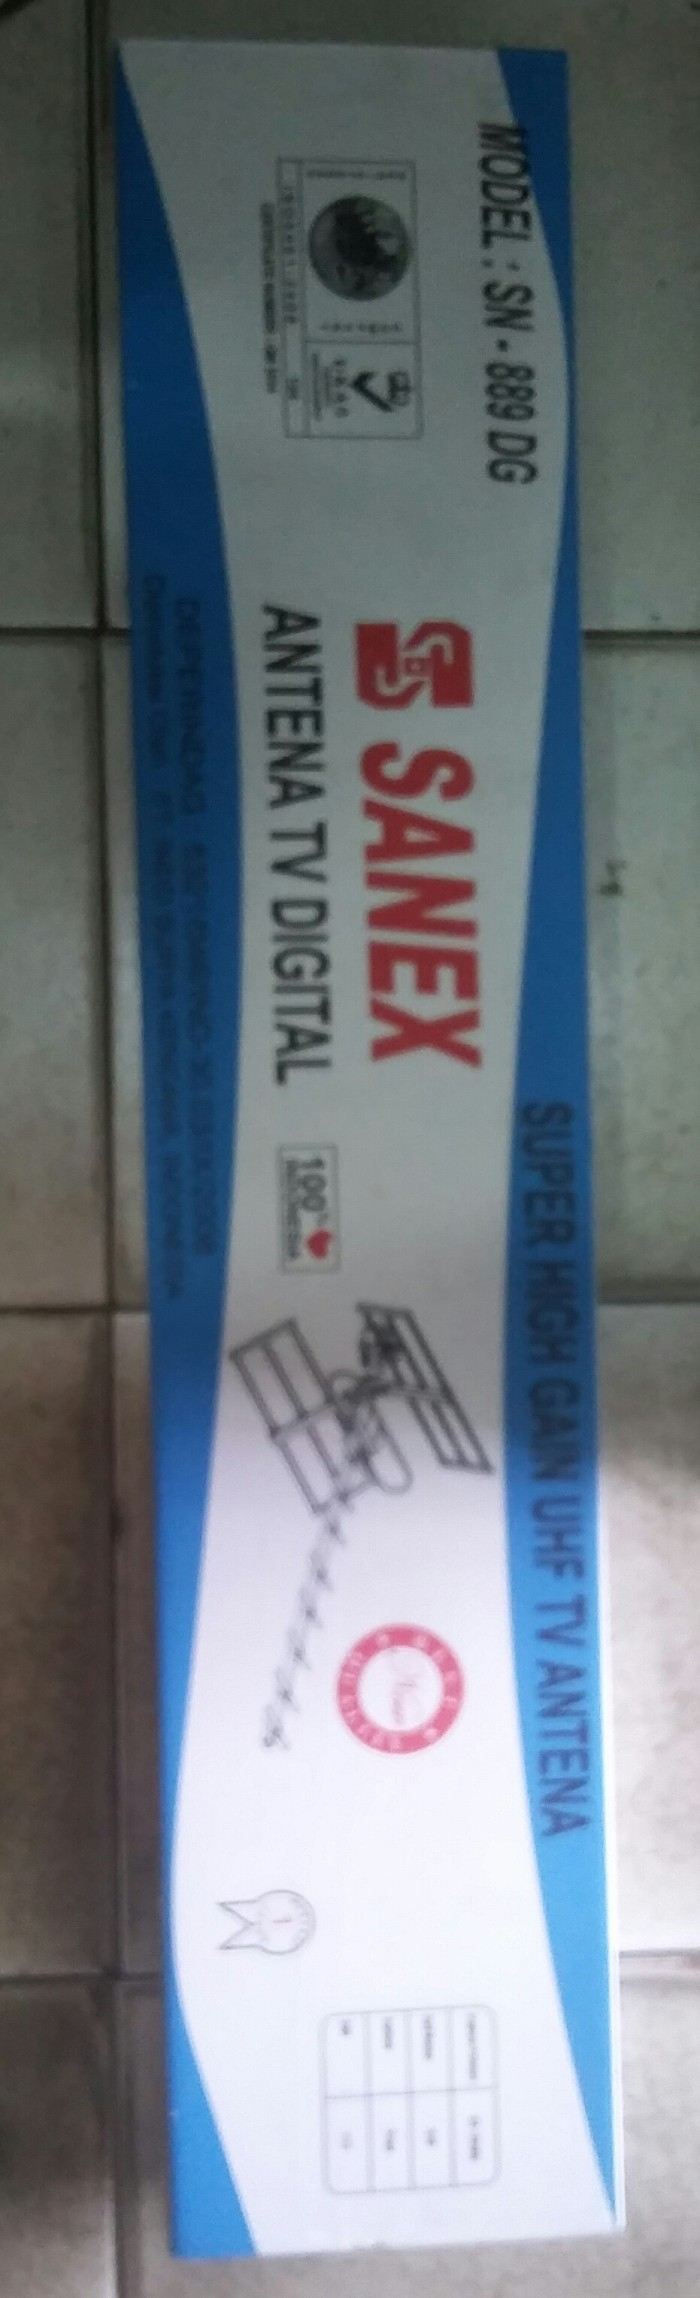 Antena tv luar led,lcd / antena outdoor digital sanex + kabel… bawah